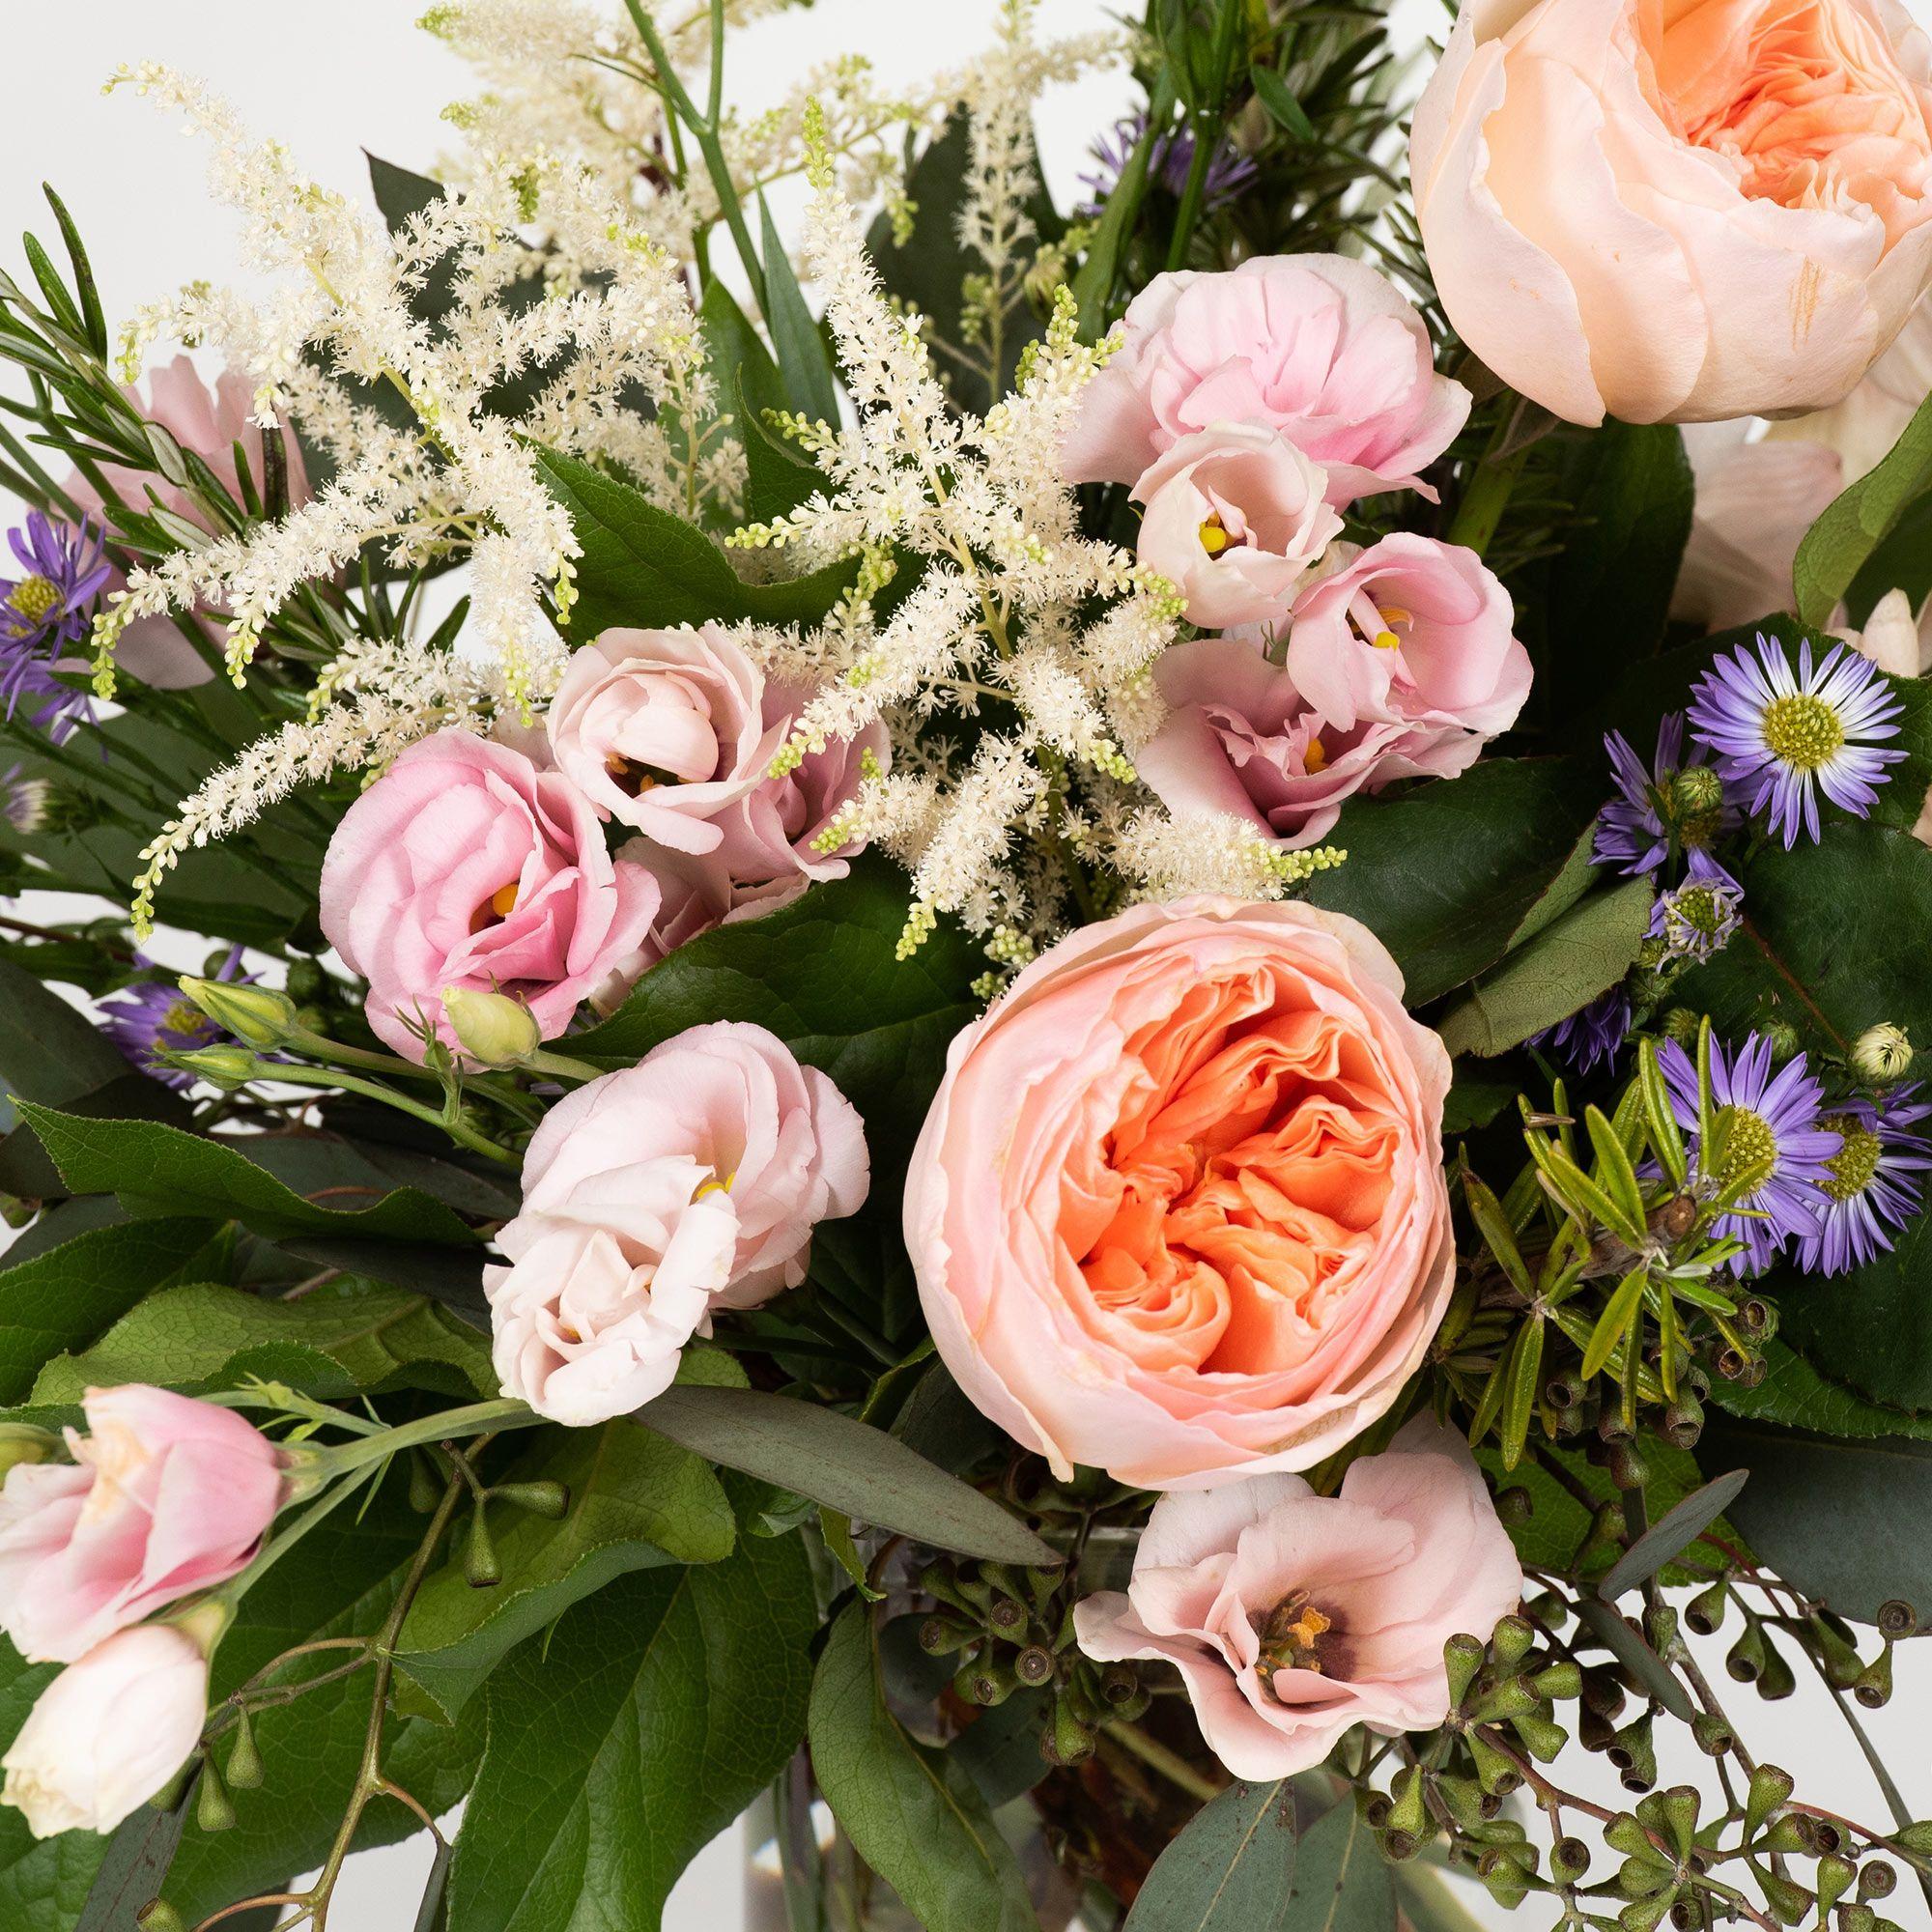 Secret Garden Seattle Florist: Flower Lab | Local Flower ...